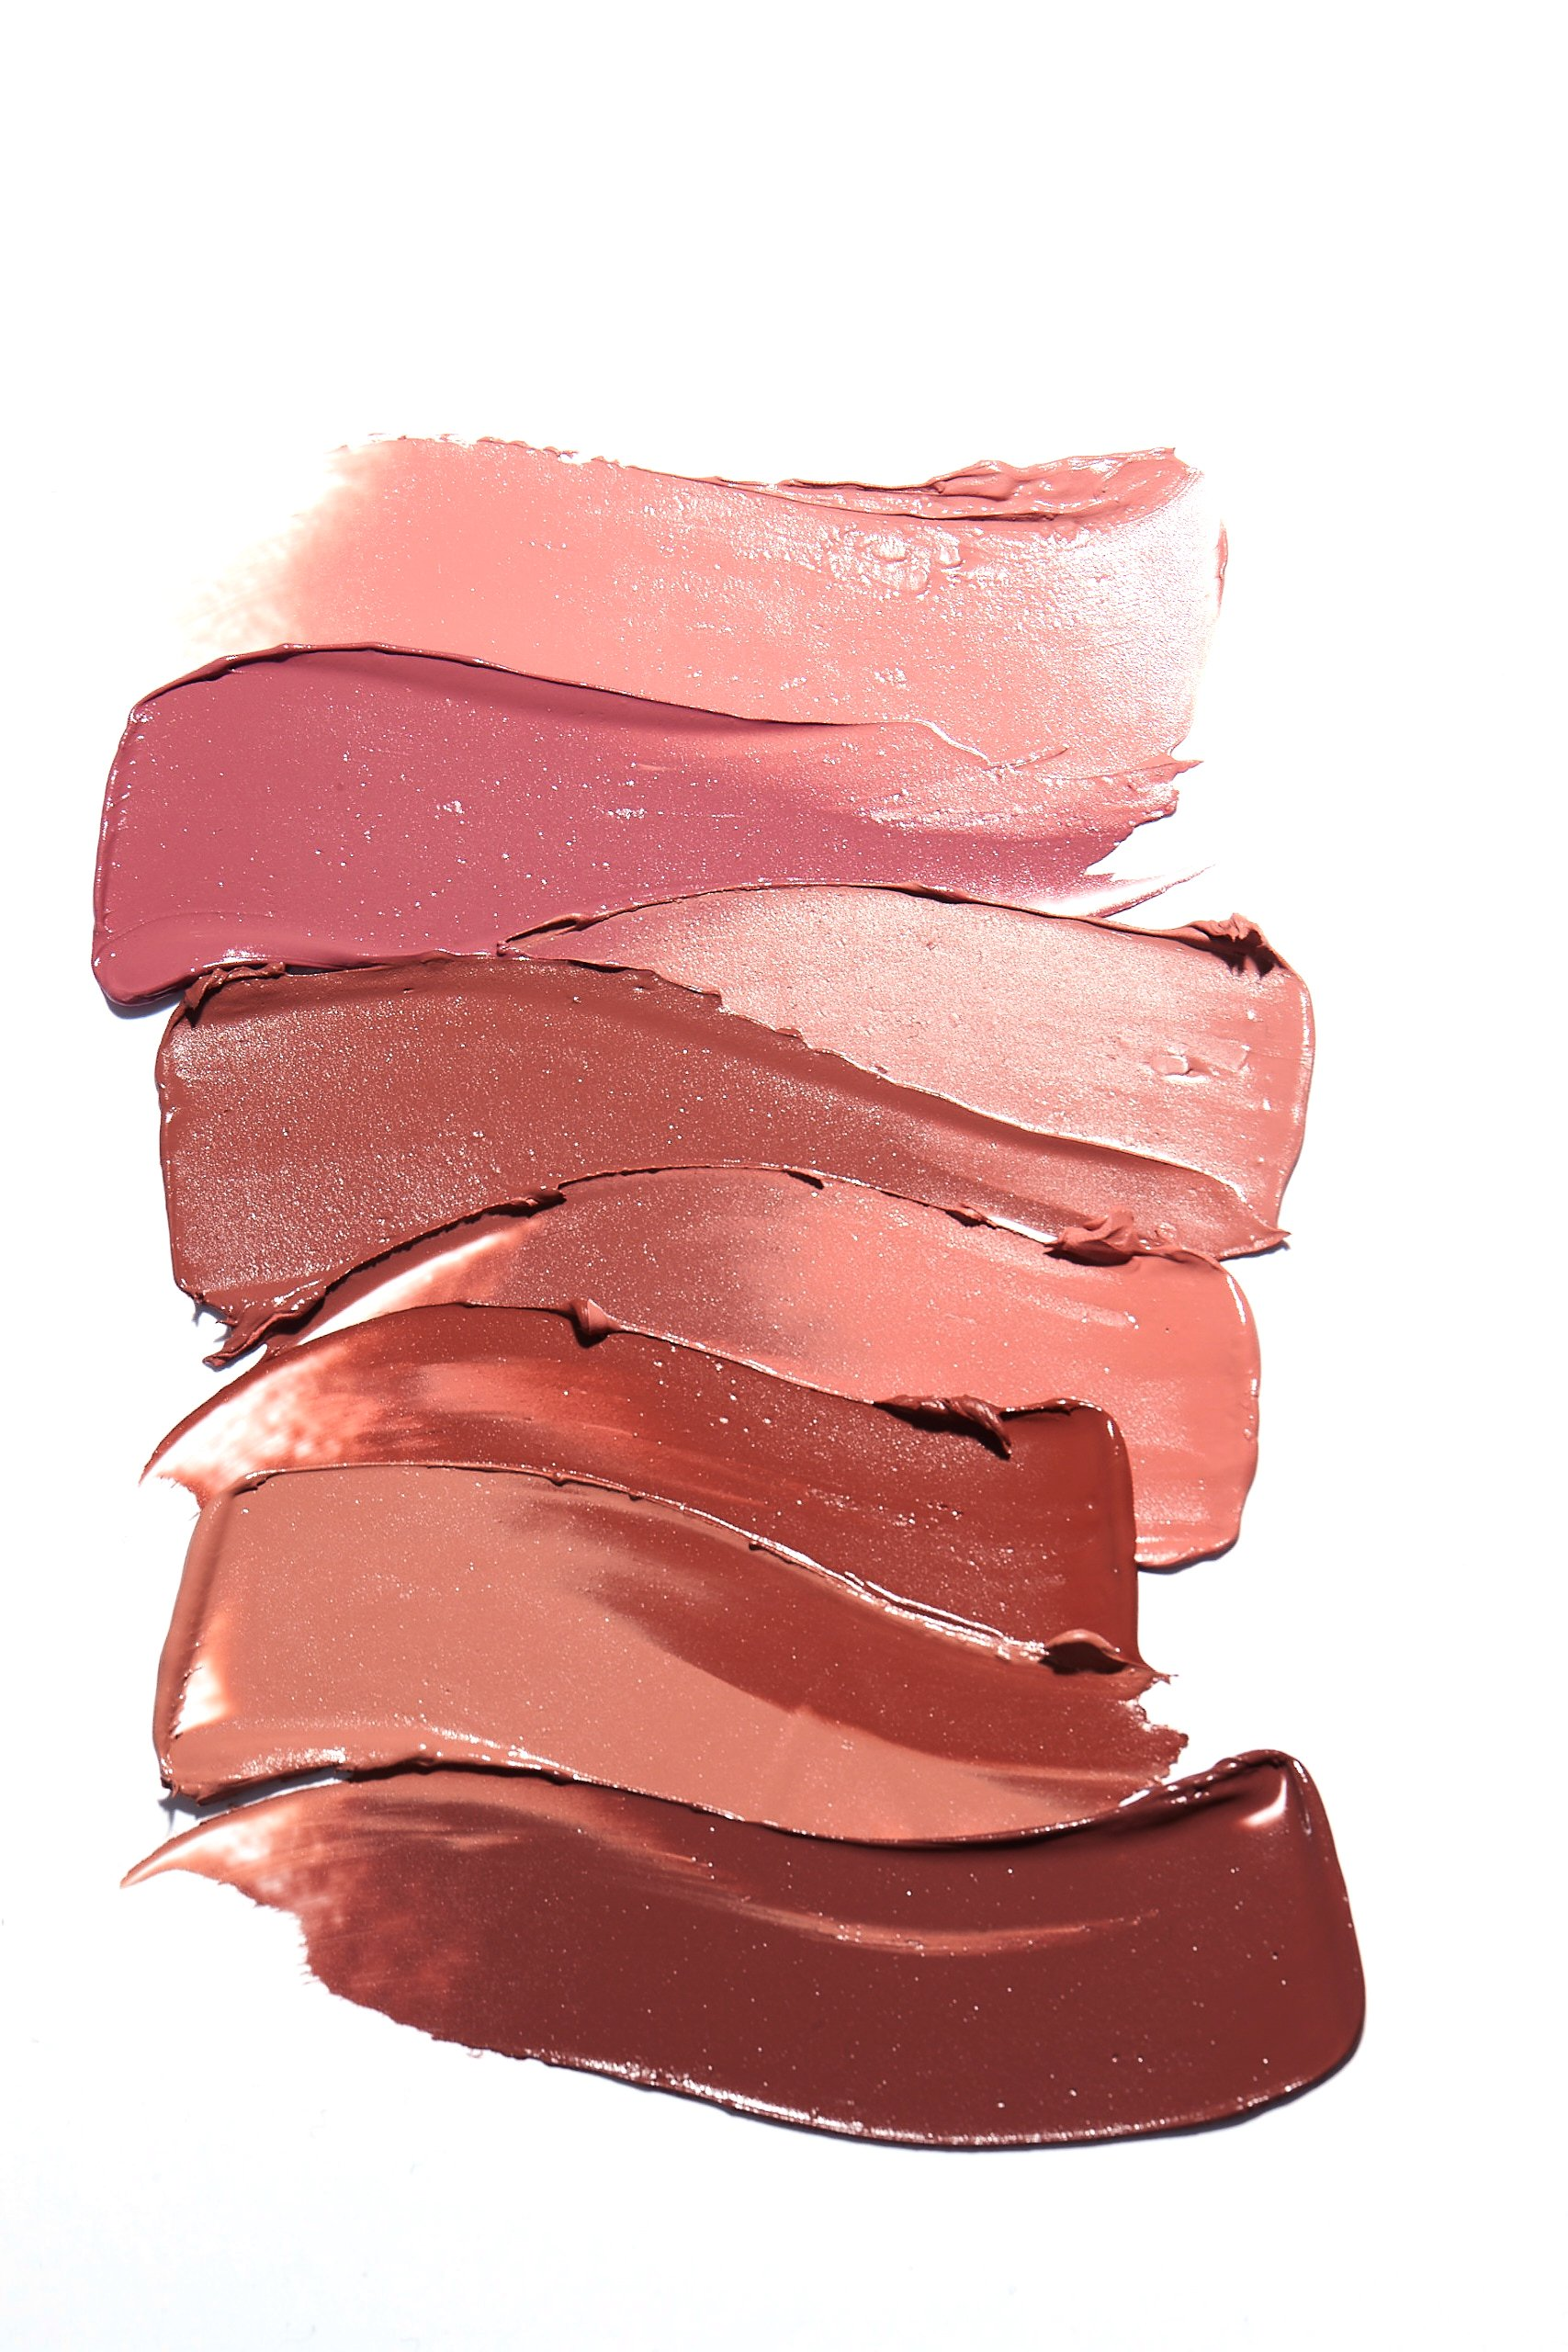 NudeNaturally-Lipsticks-Swatches